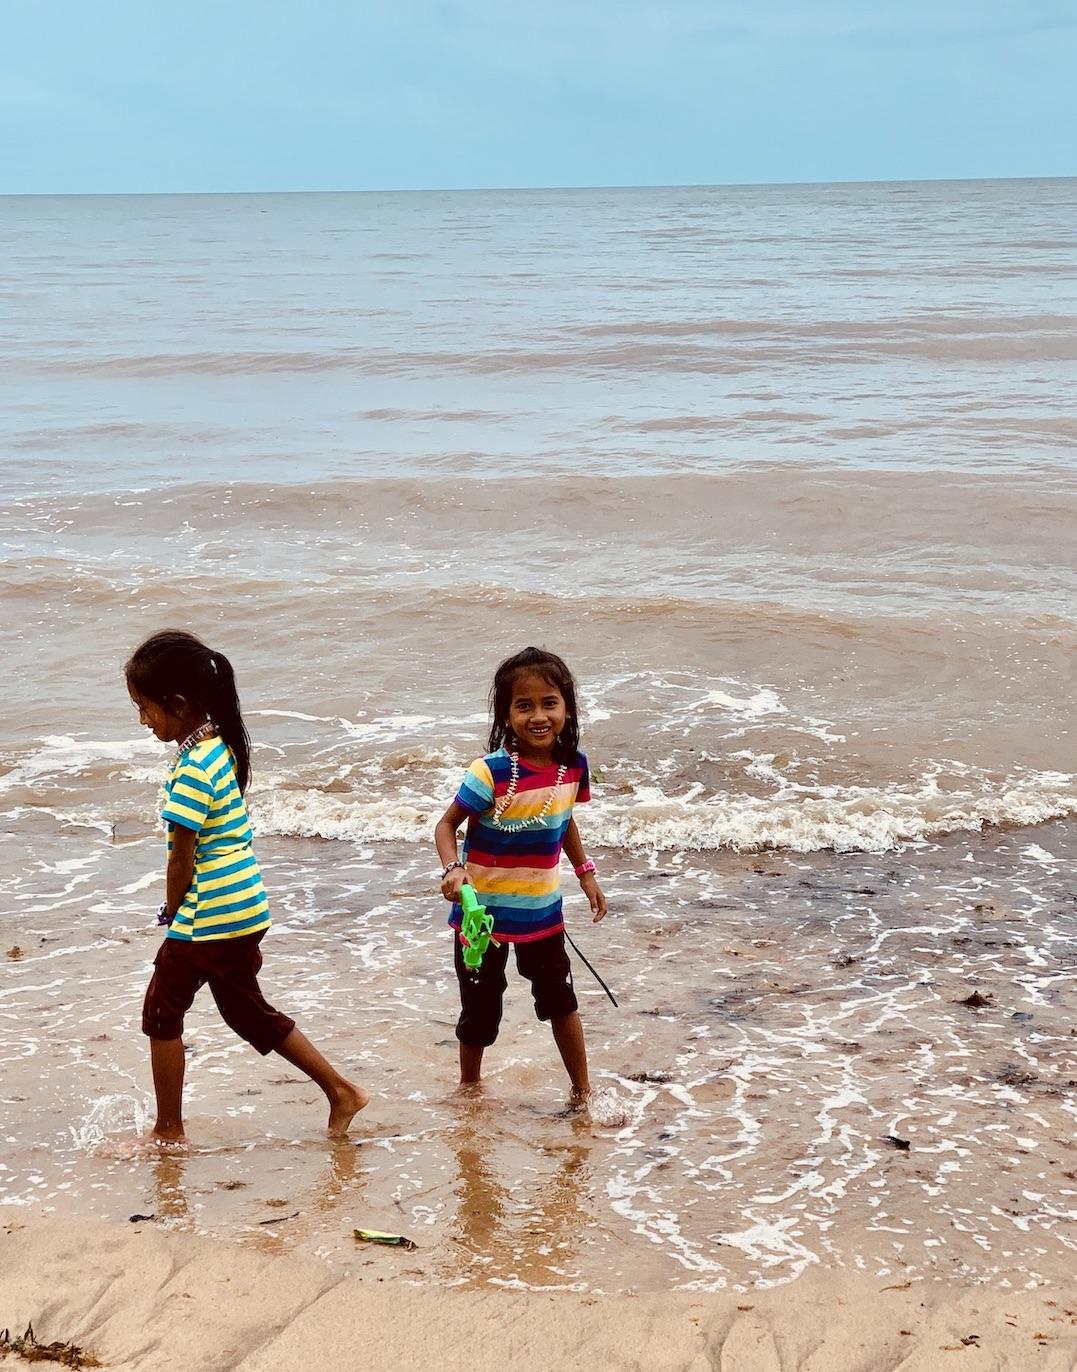 Khmer girls Kep Beach in Cambodia.